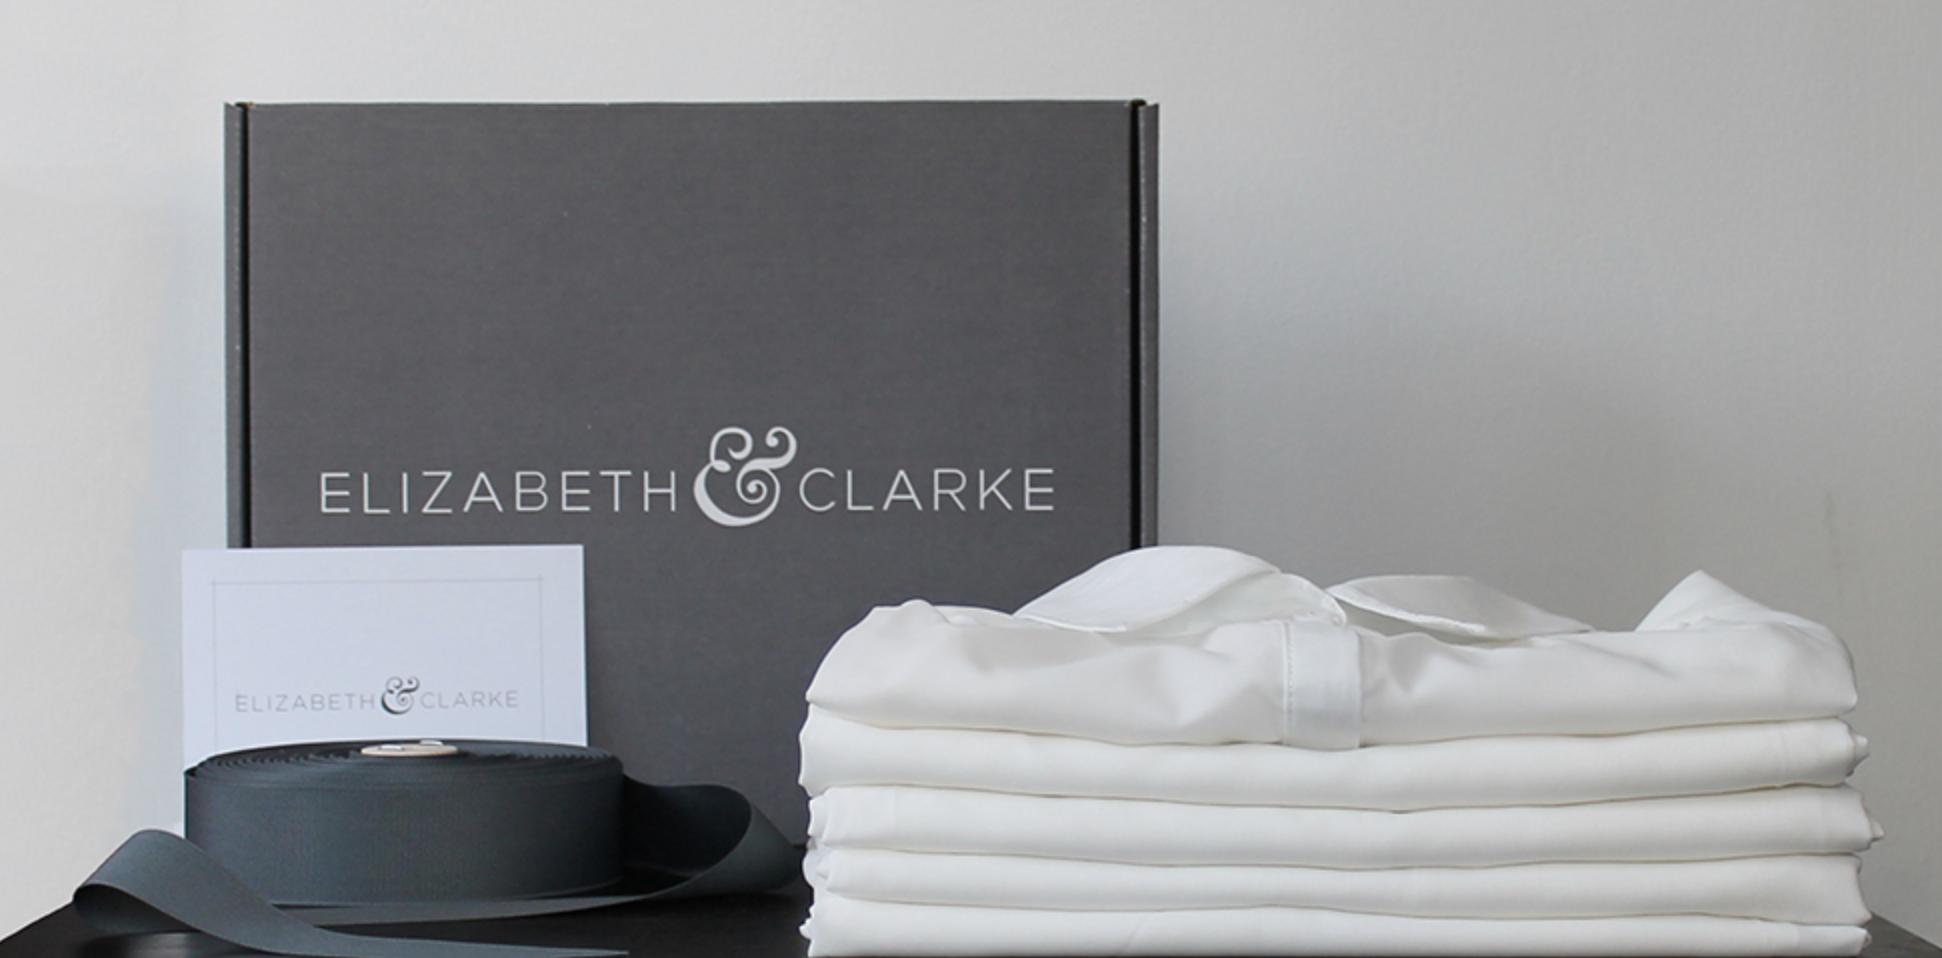 Basic white button down shirts folded next to gray Elizabeth & Clarke box